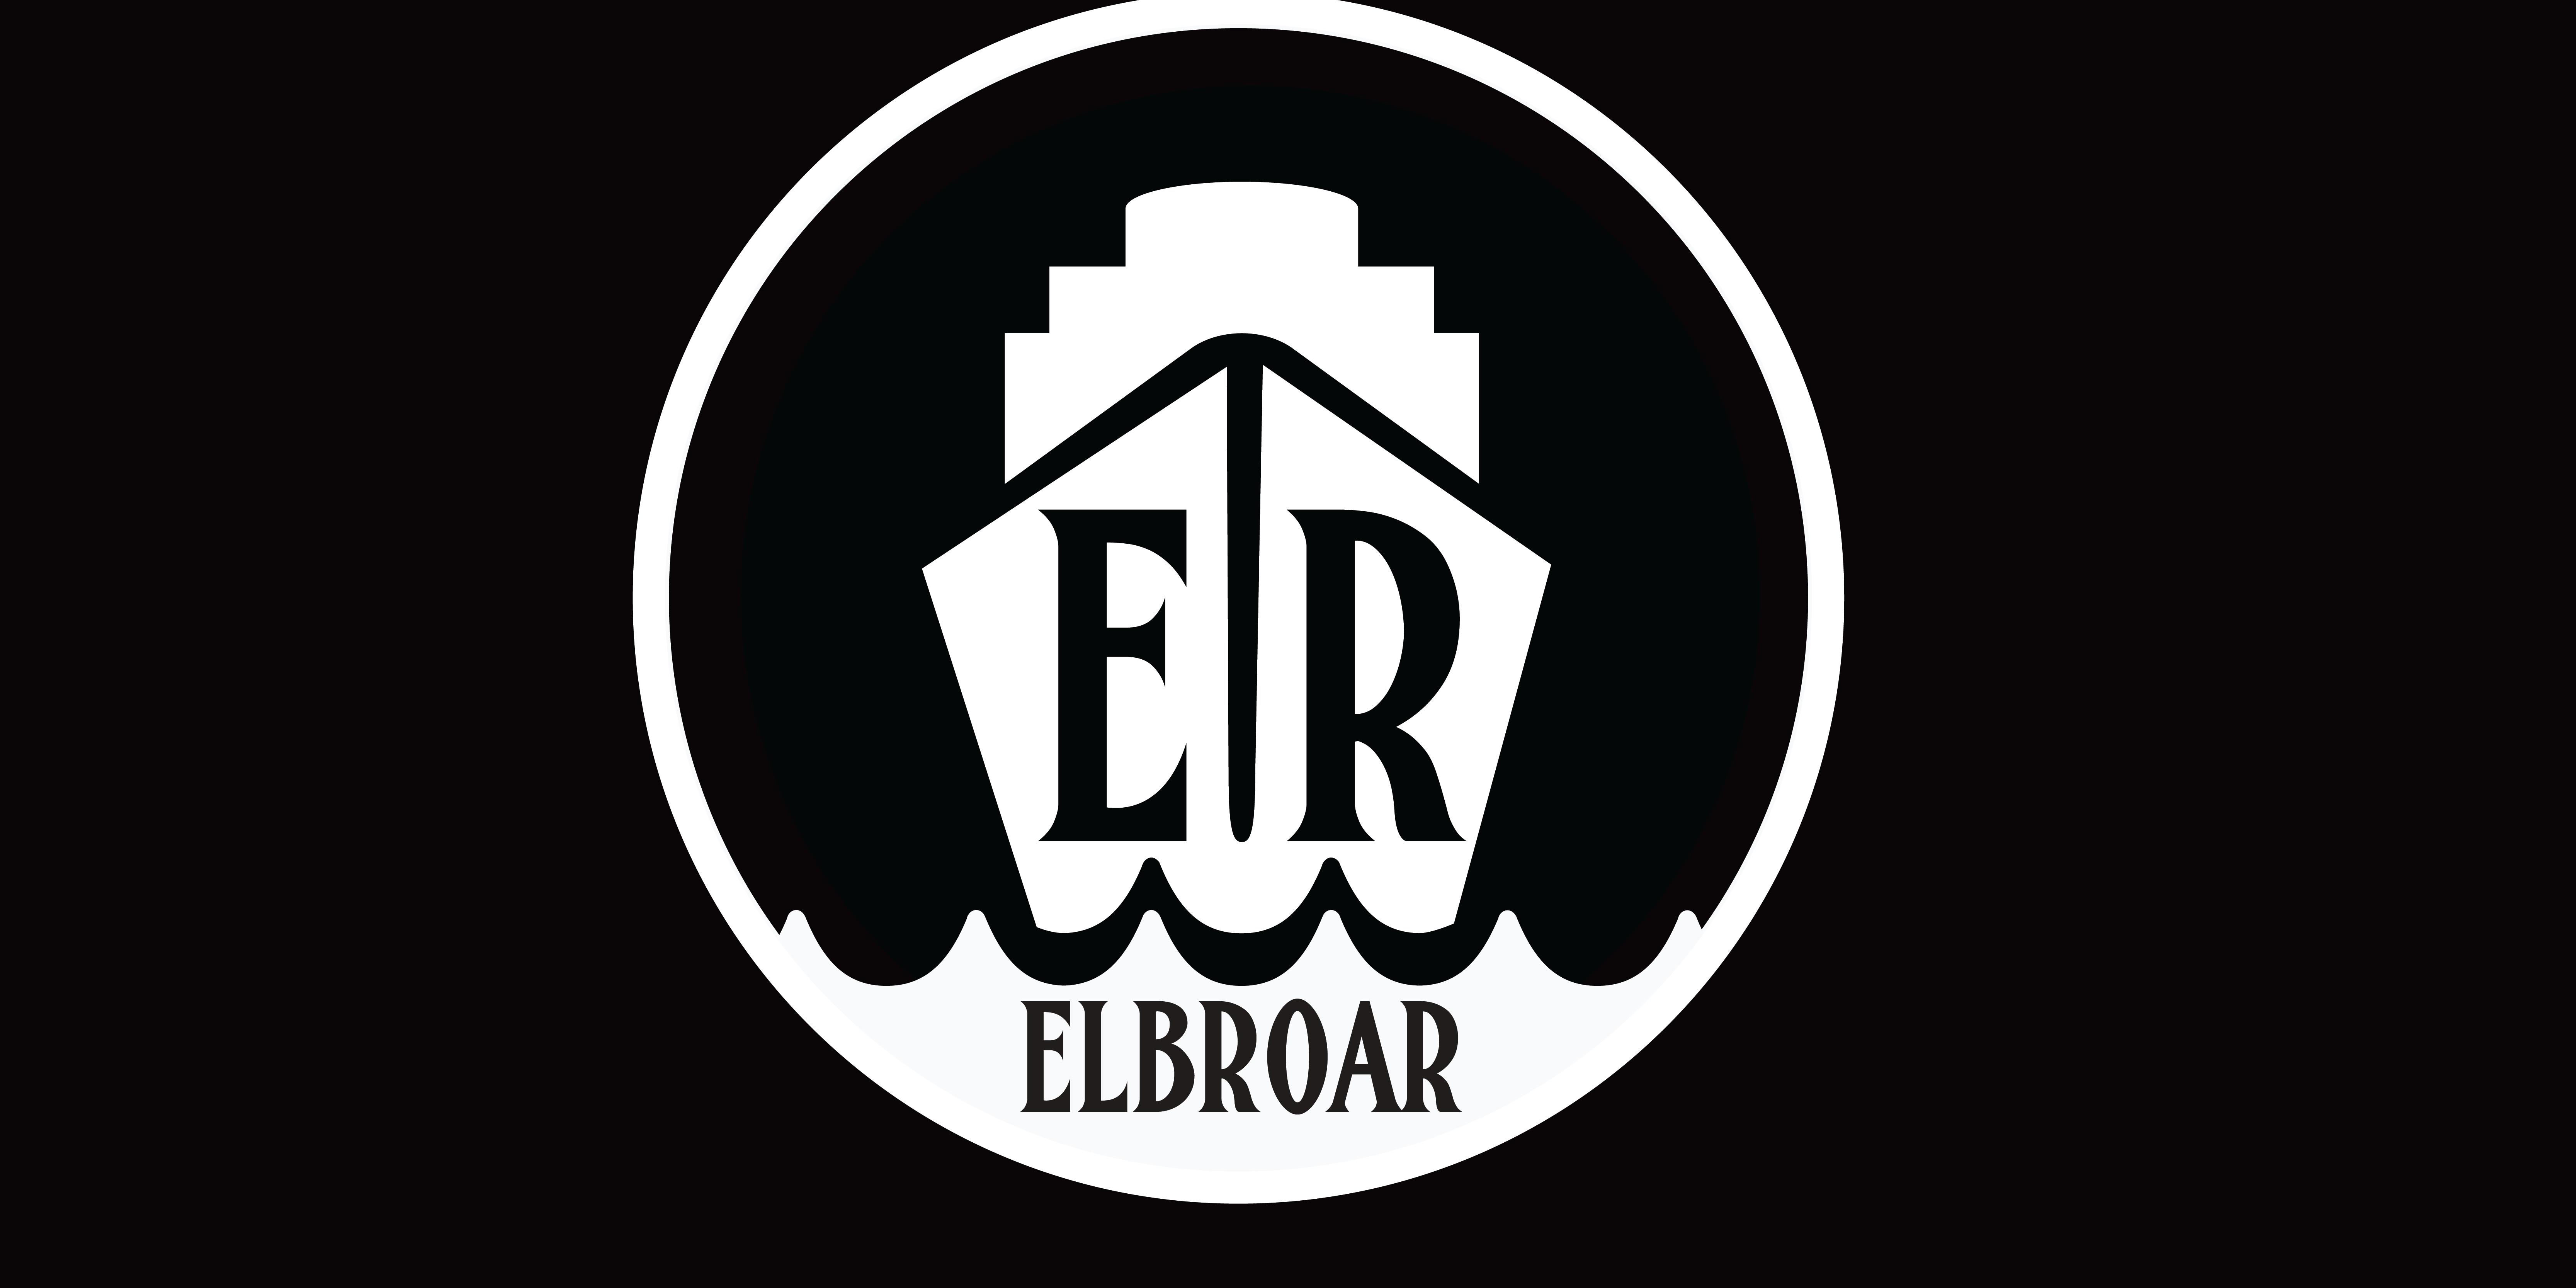 elbroarlogosw-01